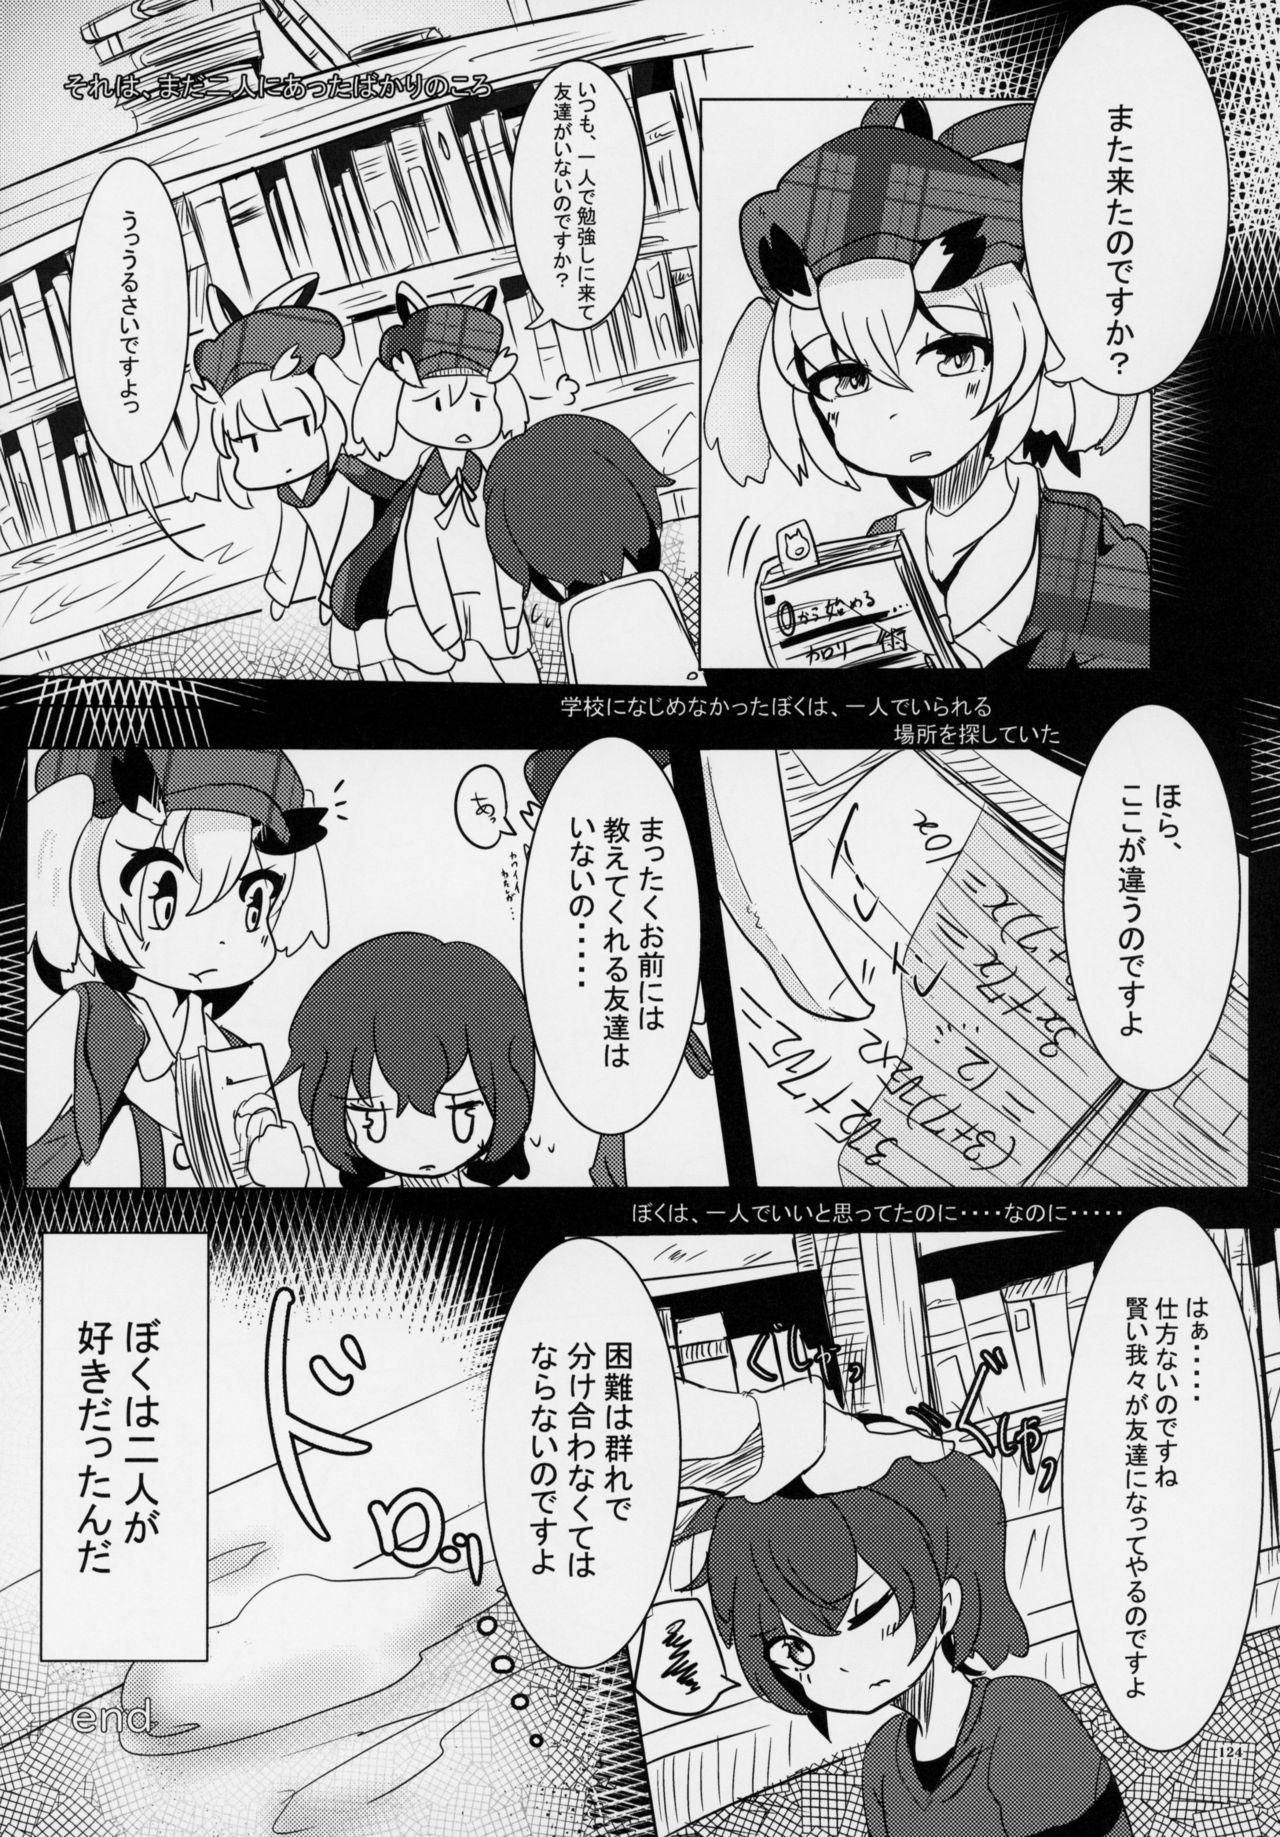 Friends Gyaku Rape Goudoushi 122